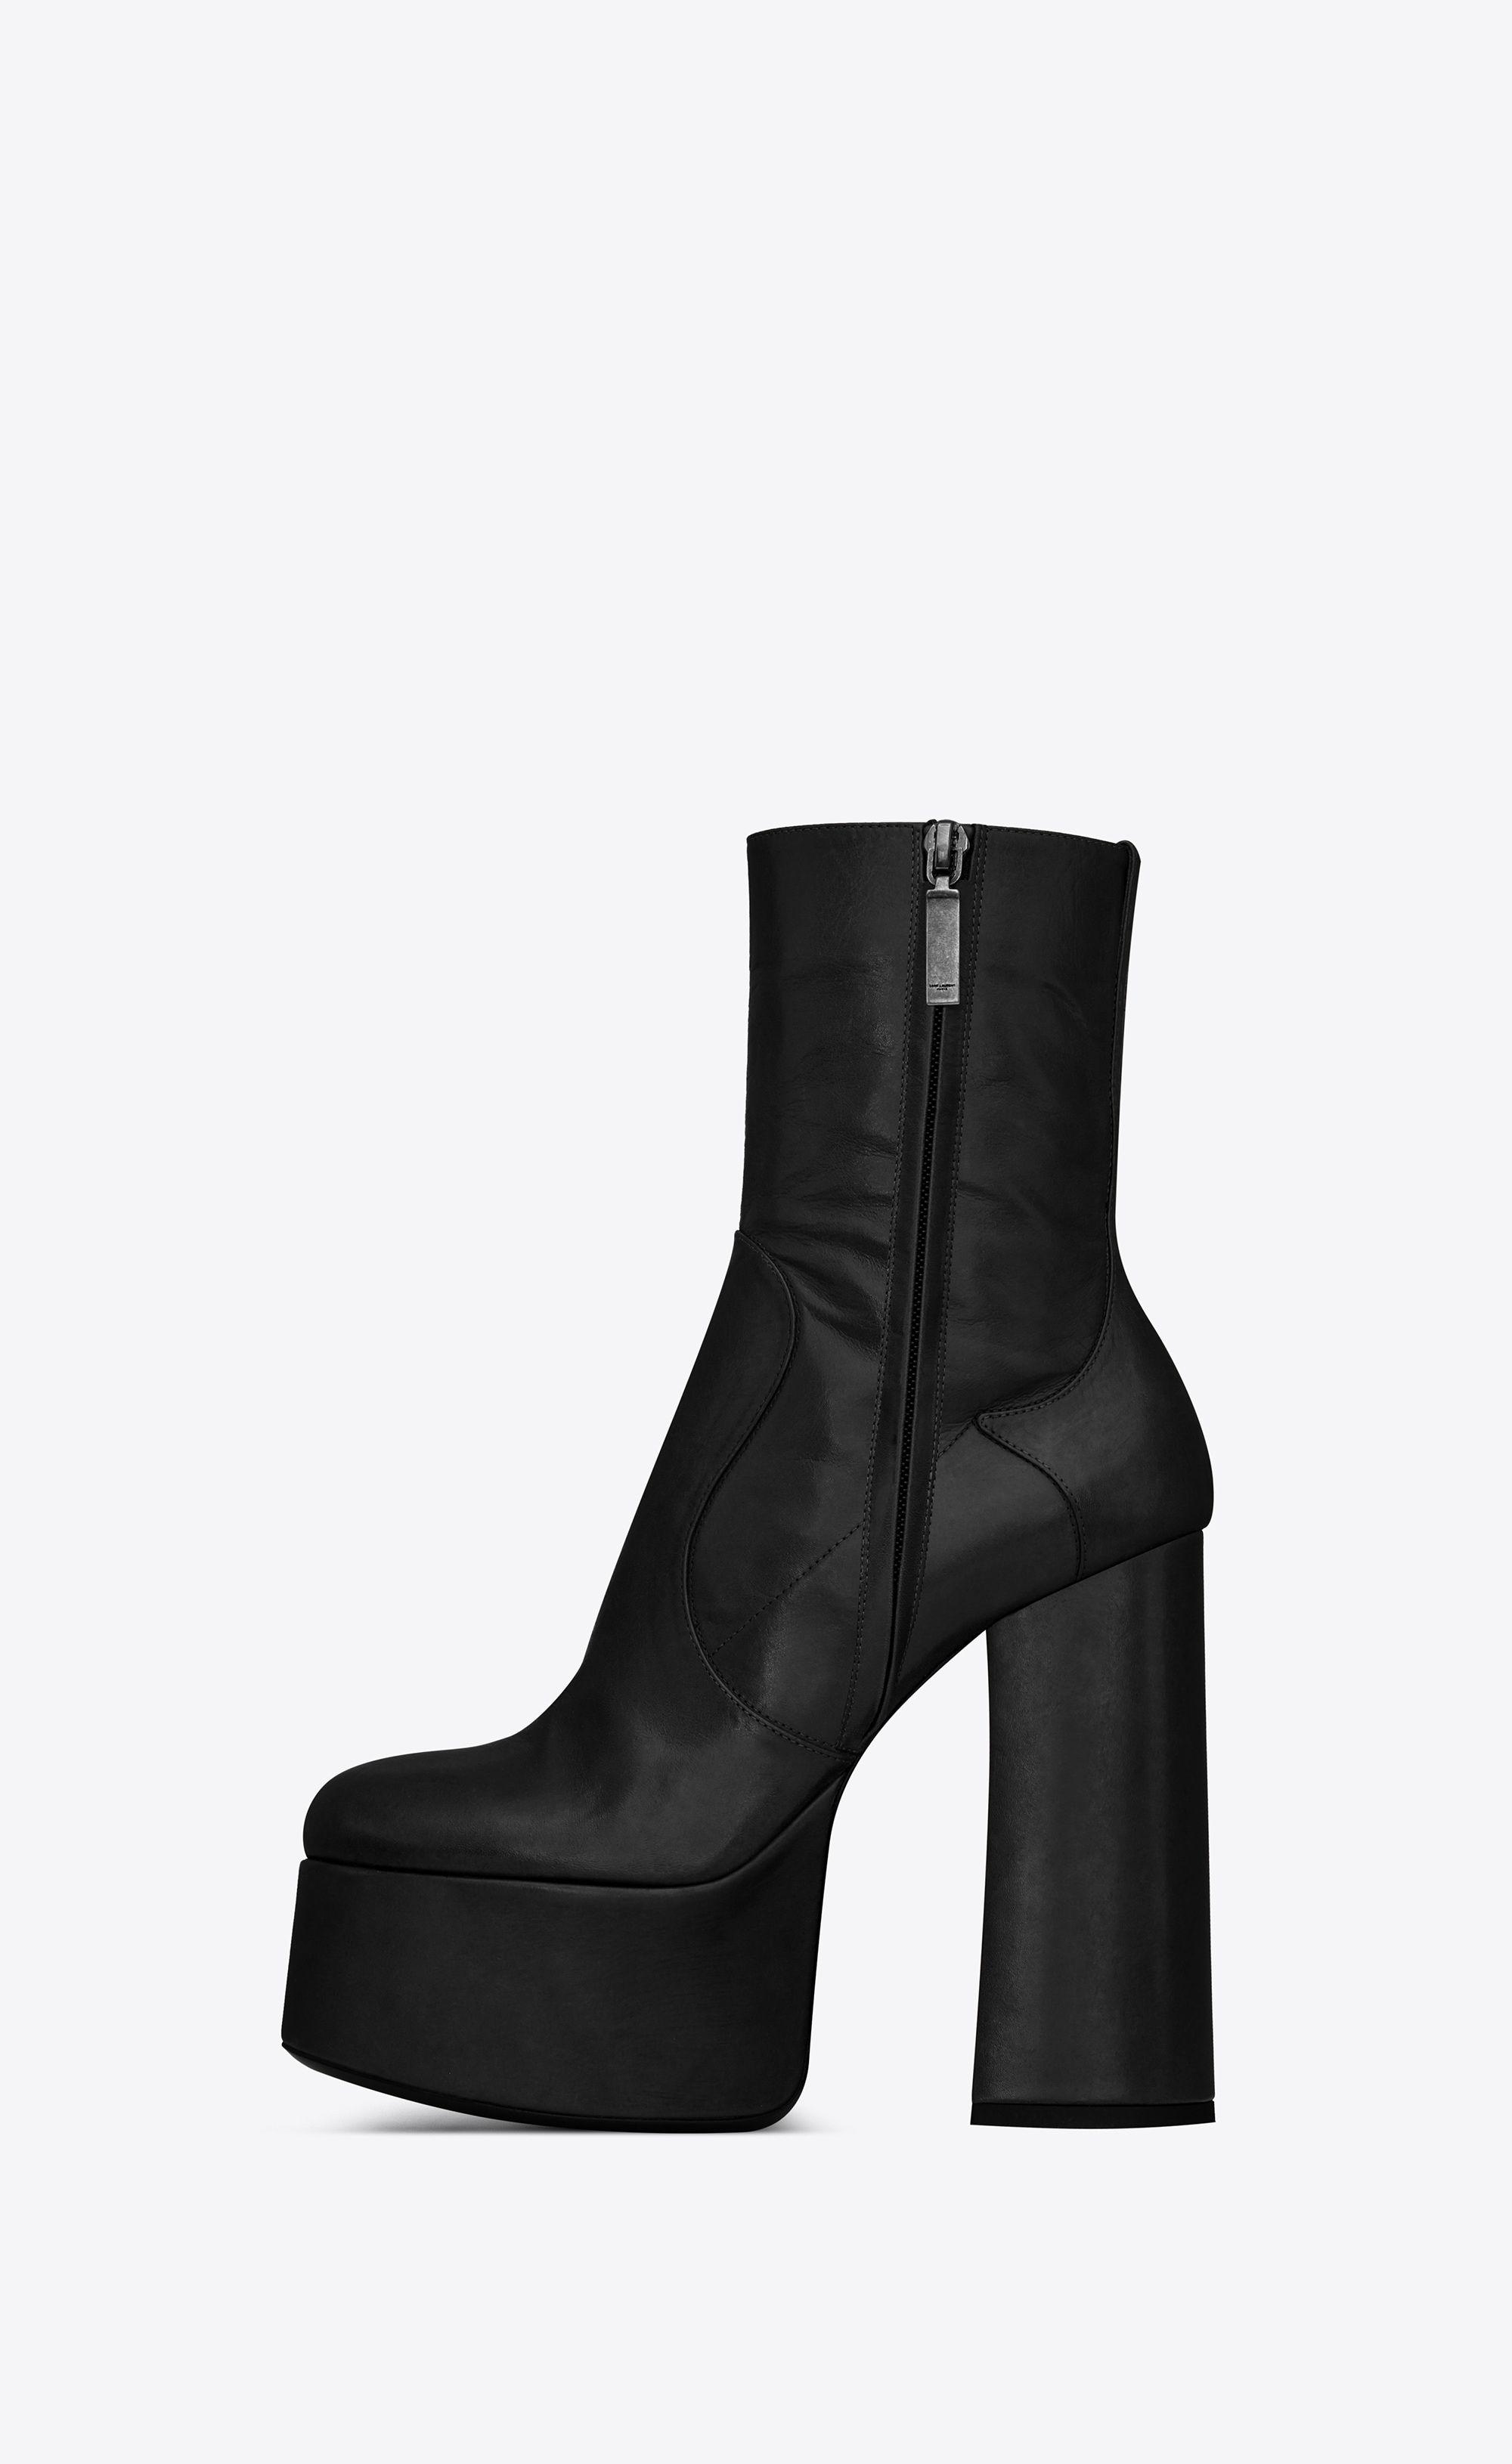 66db83903e7 Saint Laurent Billy Platform Bootie In Leather | YSL.com | shoes ...